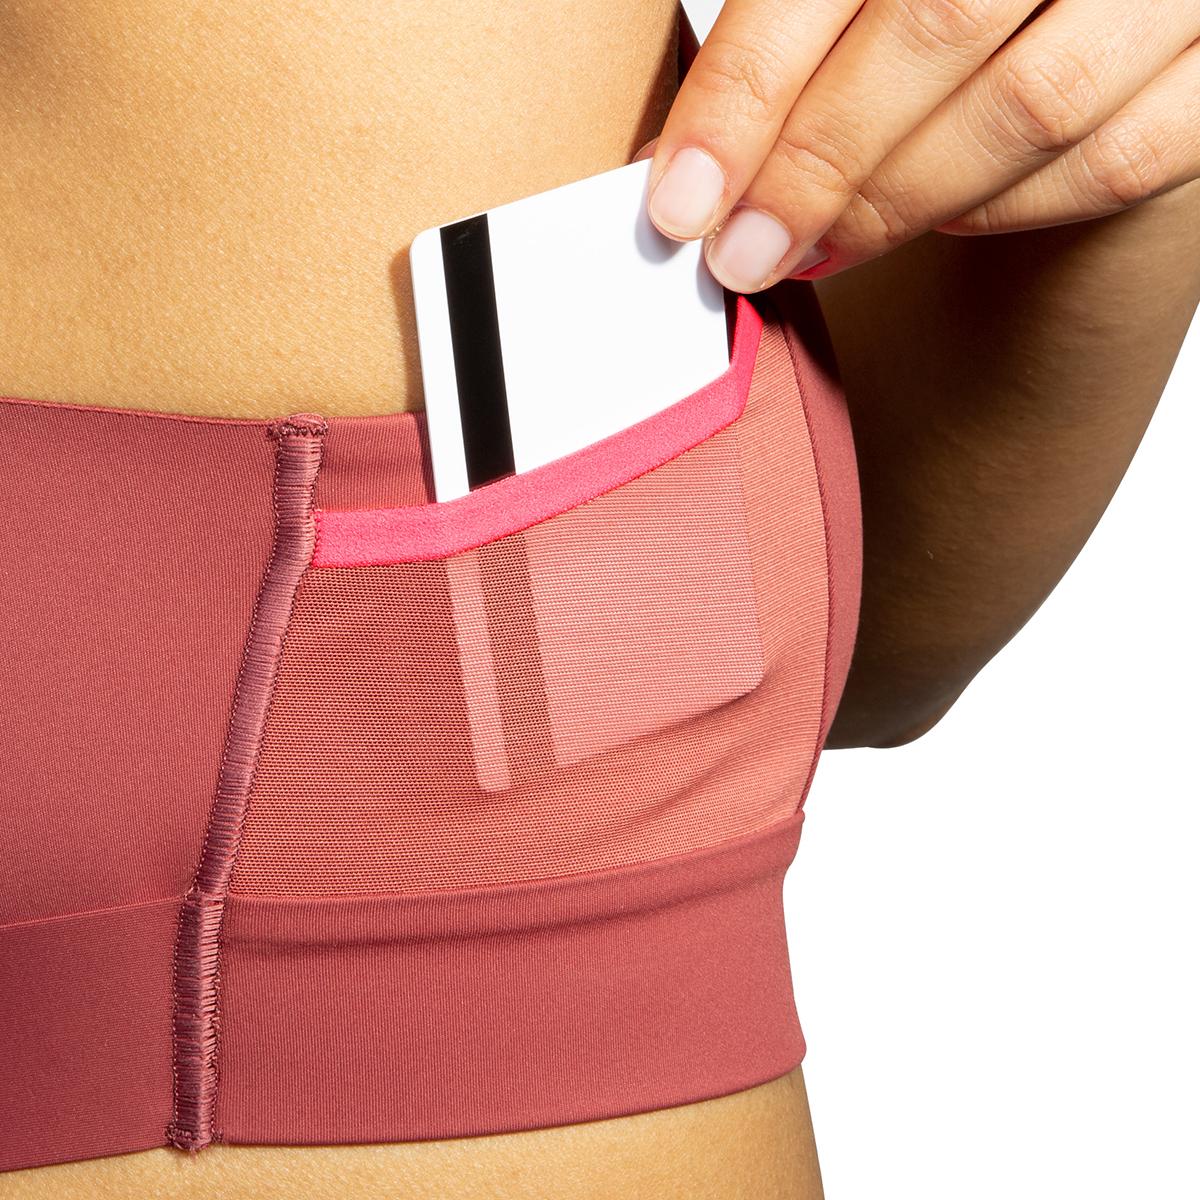 Women's Brooks Drive 3 Pocket Run Bra - Color: Terracotta/Fluoro Pink - Size: 30AB, Terracotta/Fluoro Pink, large, image 3